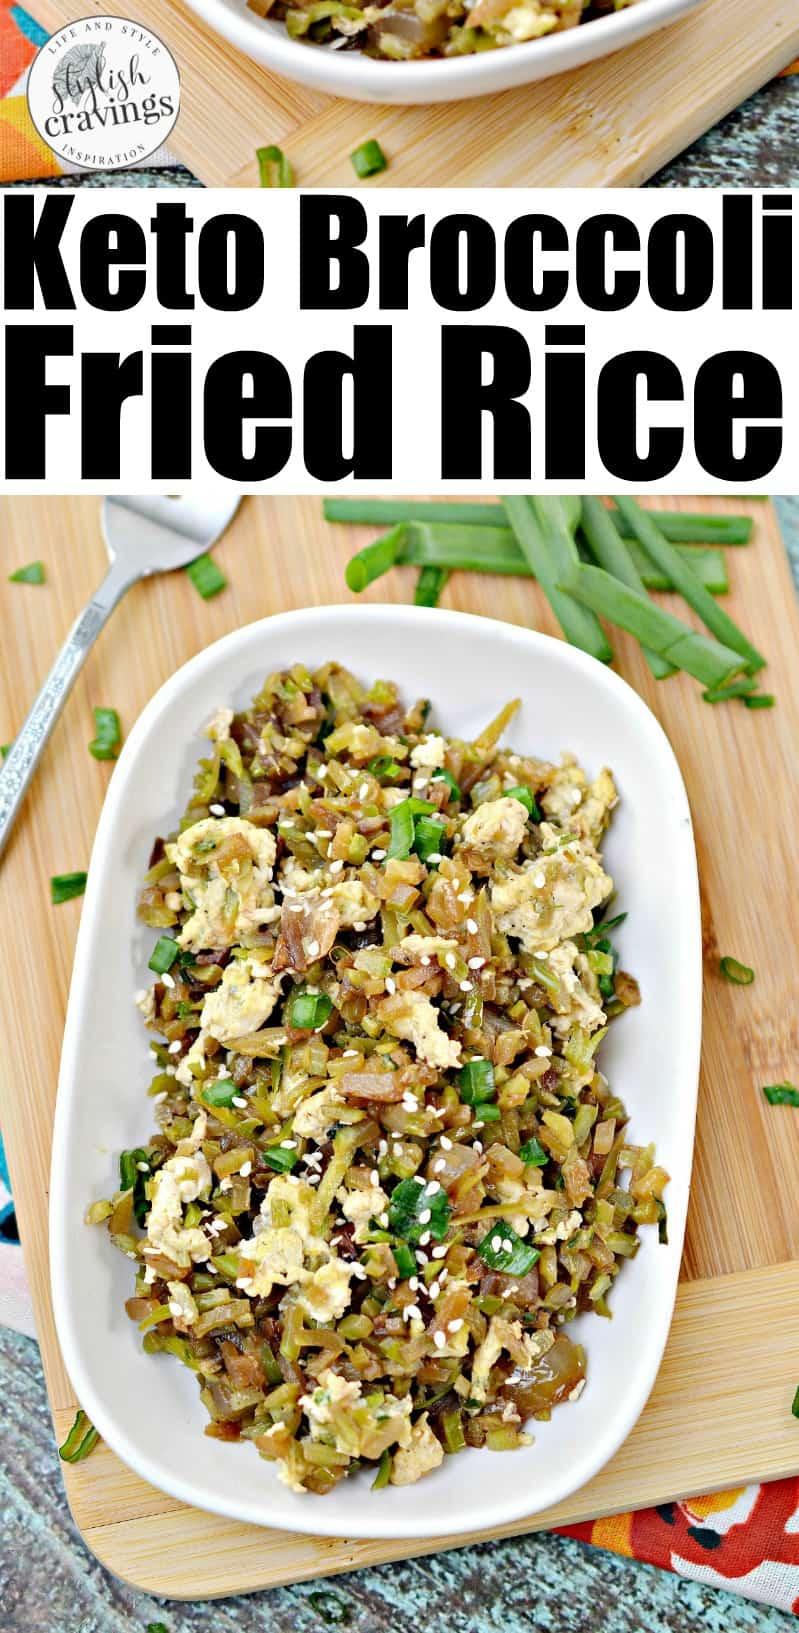 Keto Broccoli Fried Rice